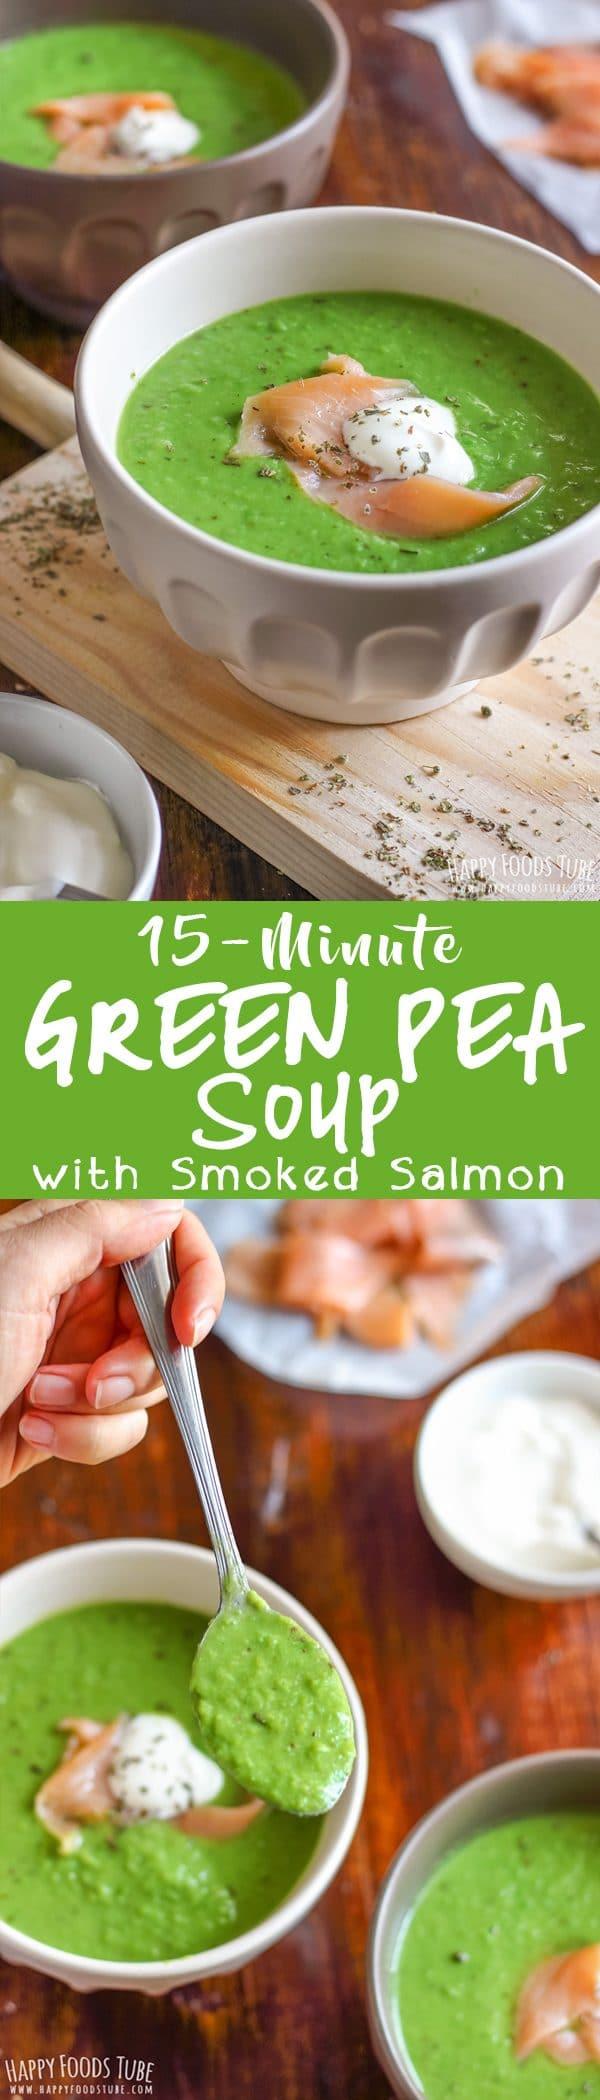 15 Minute Green Pea Soup Recipe Picture